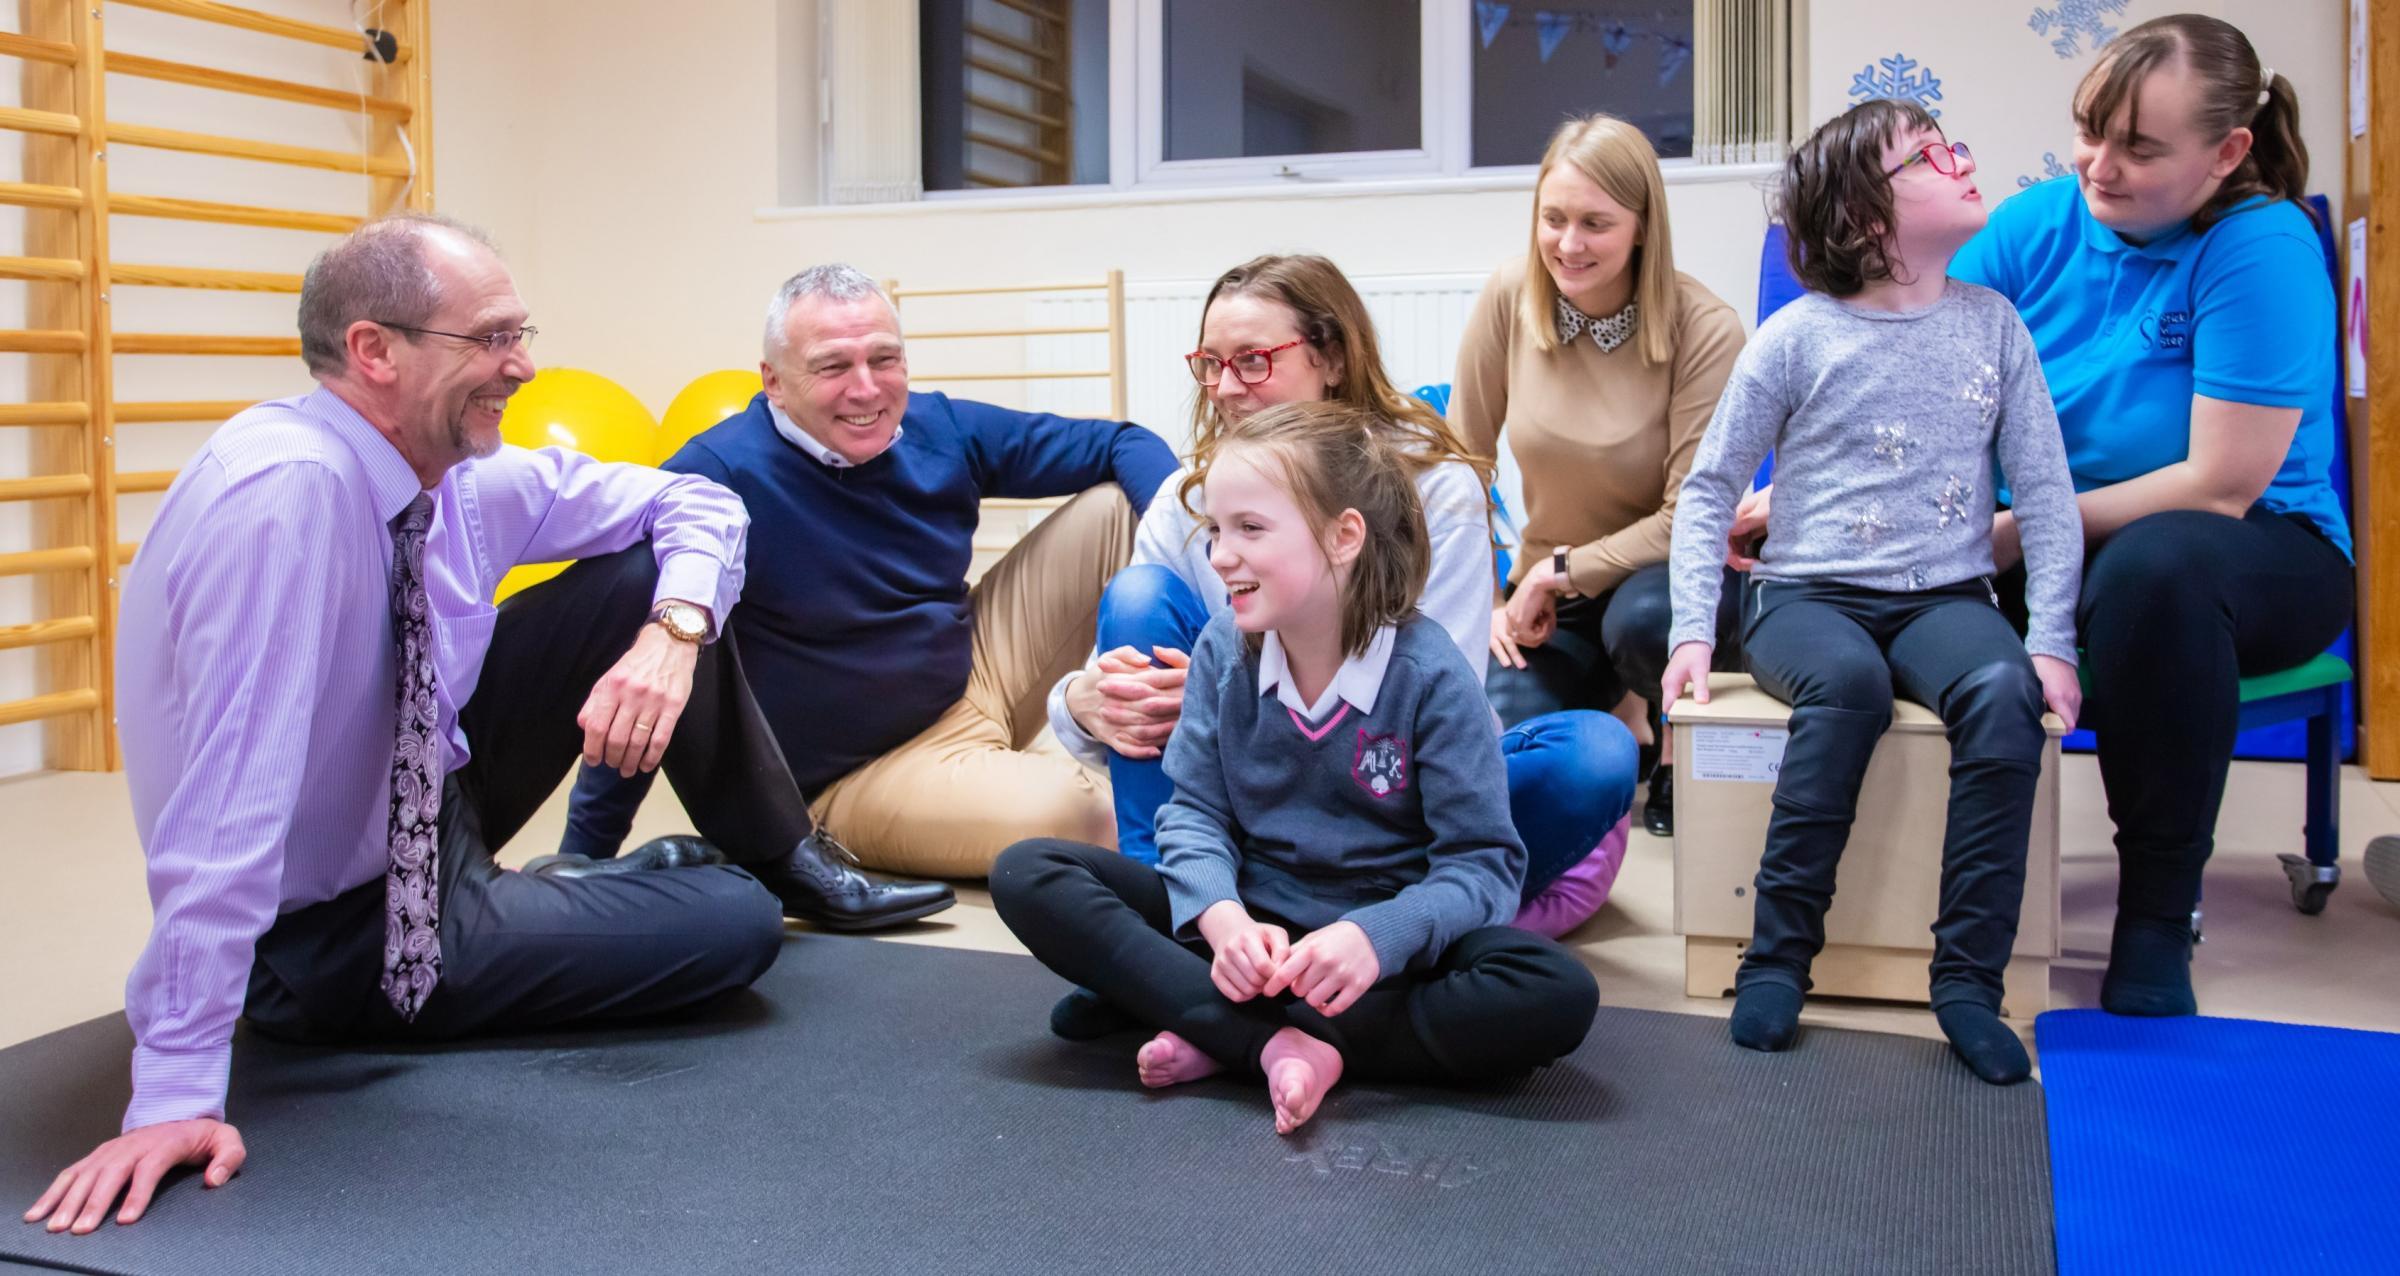 Sci-Tech Daresbury donates £10,000 to Stick 'n' Step charity